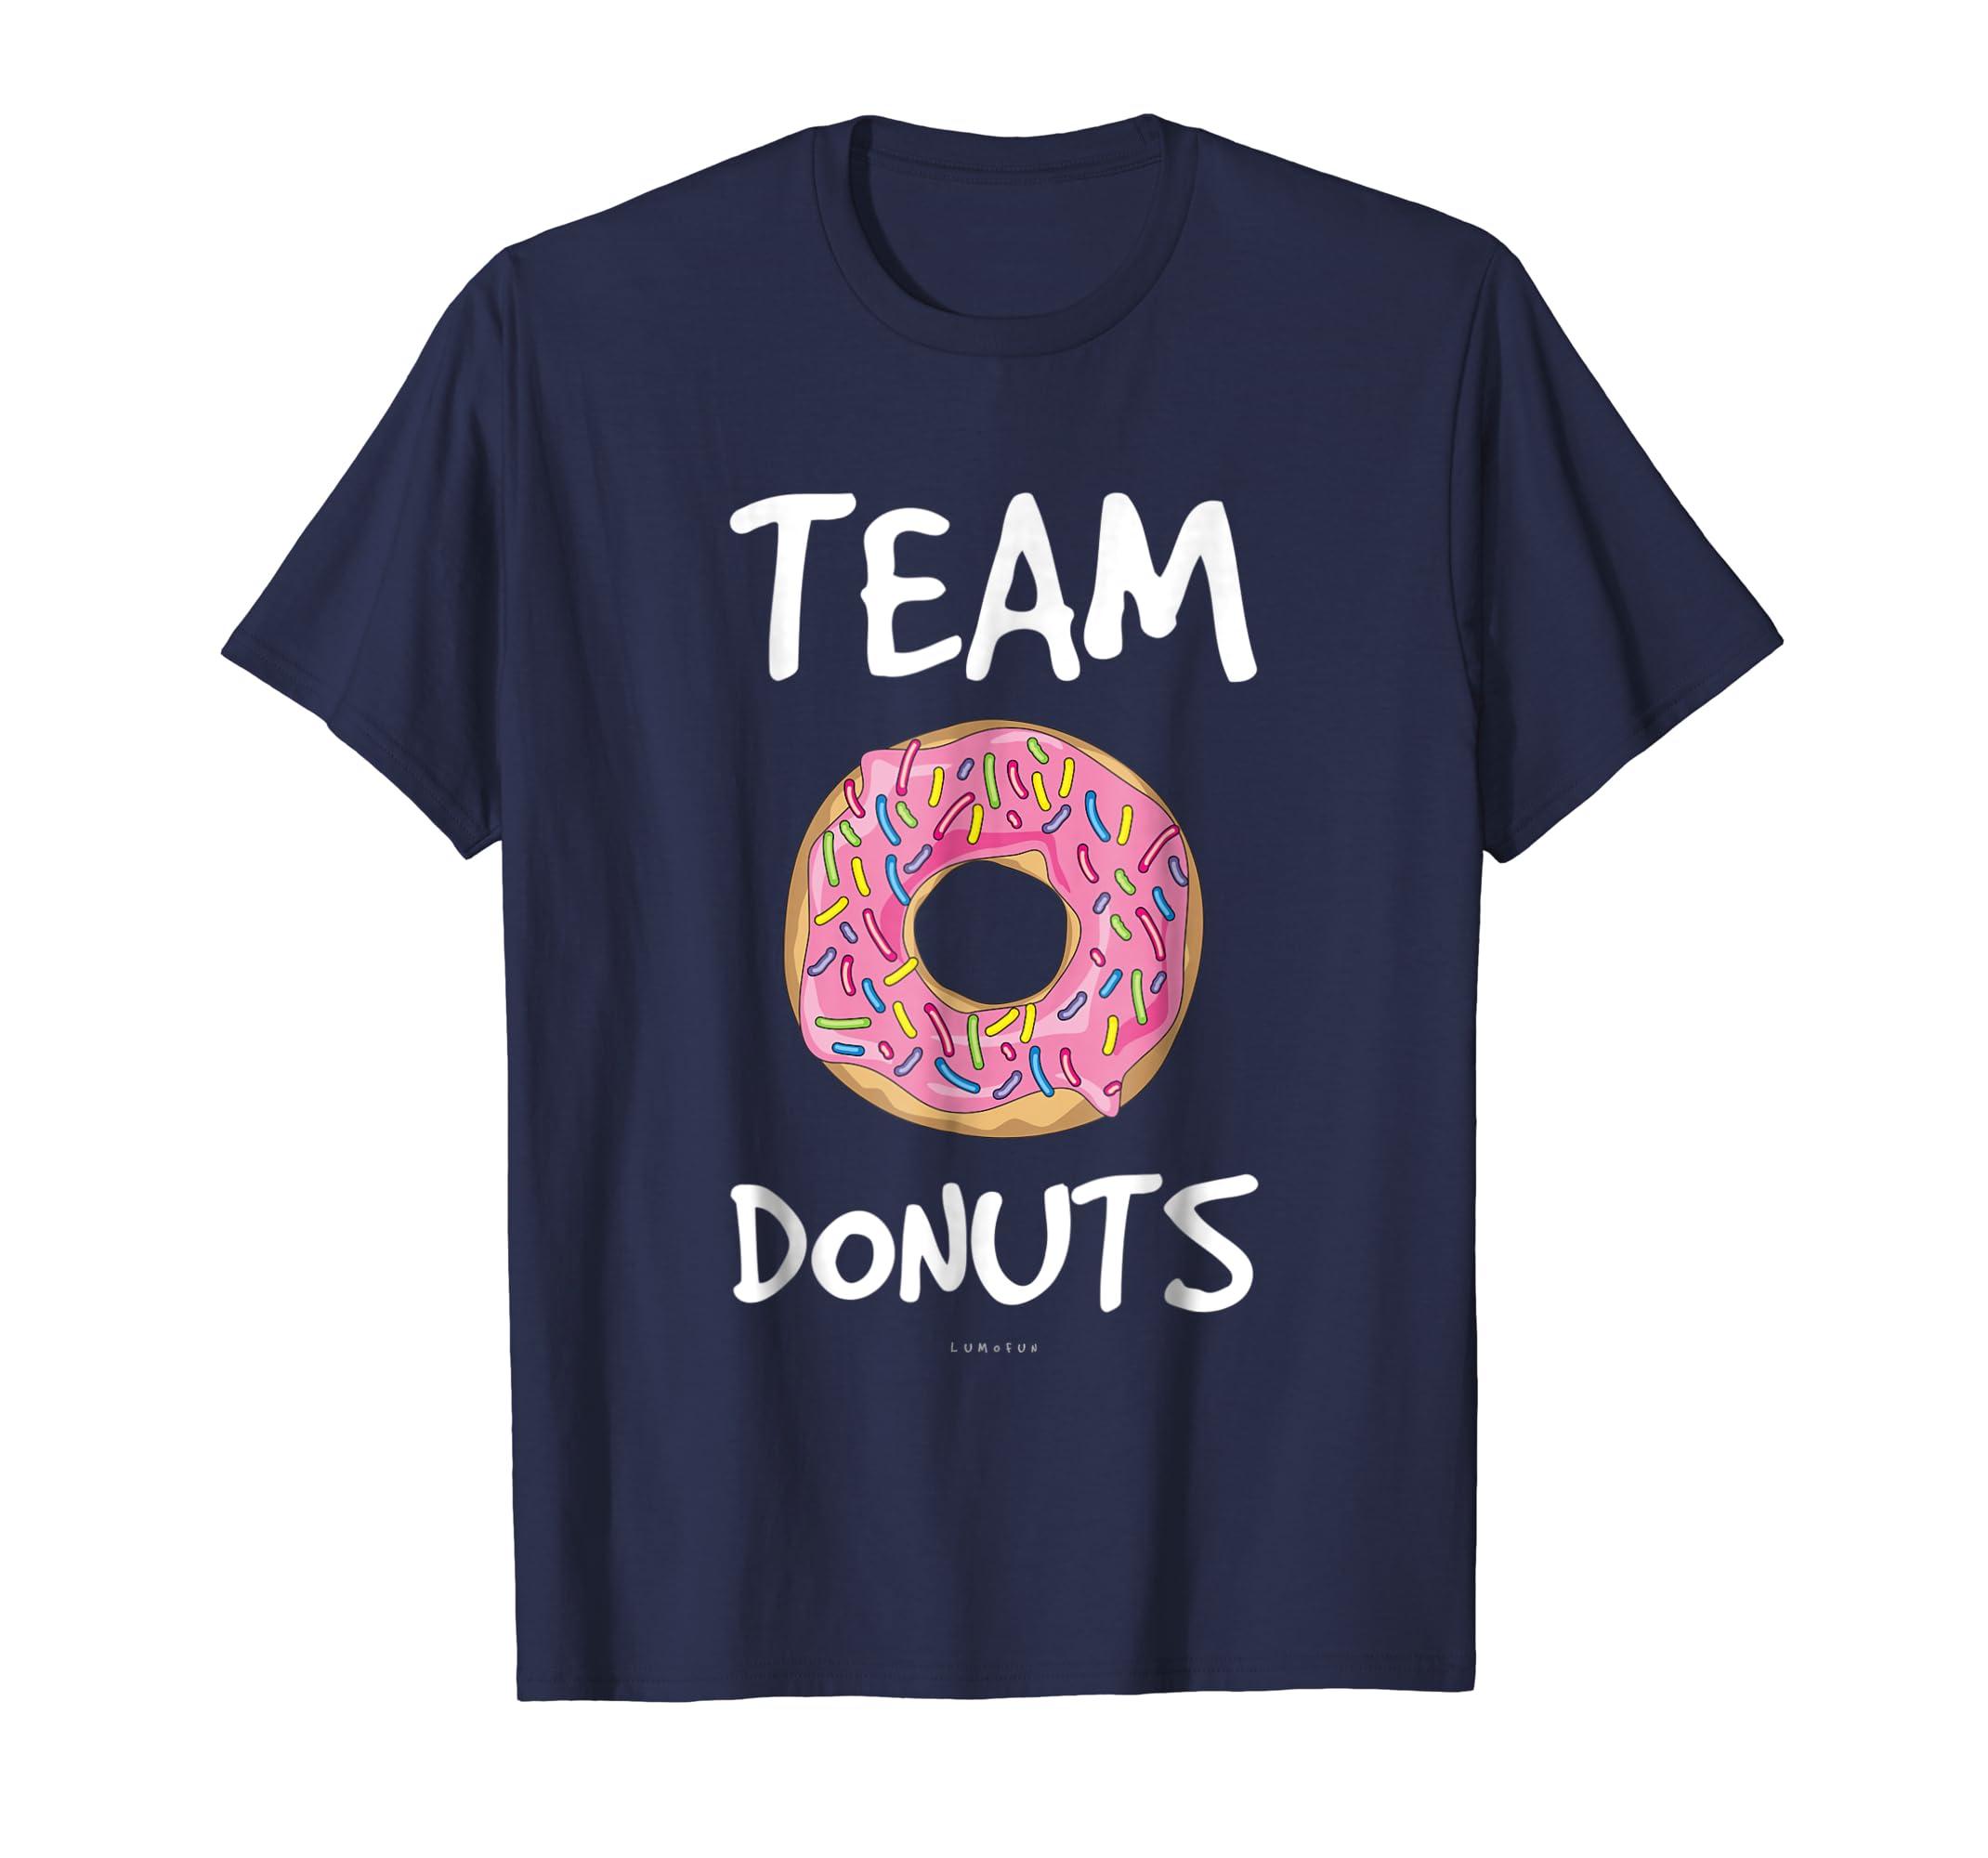 0d6d0f46f Amazon.com: Funny Gift Shirt: Team Donuts Tee - Funny Donut Shirts: Clothing